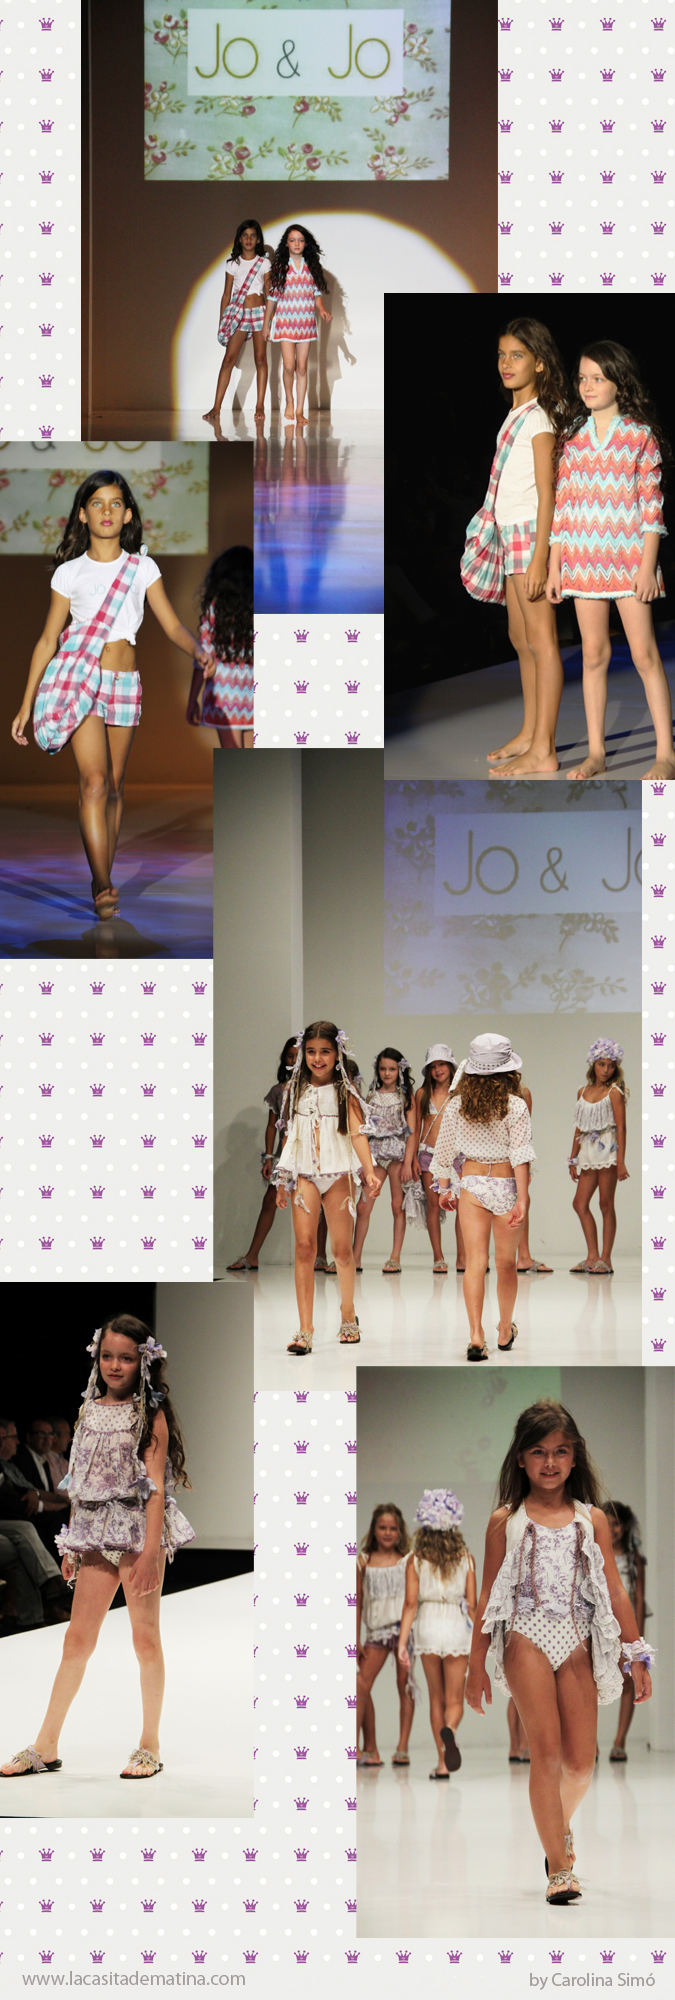 LARRANA  SAPYTOS FIMI LAQUINTA JO JO La casita de Martina Blog de Moda Infantil y Premamá